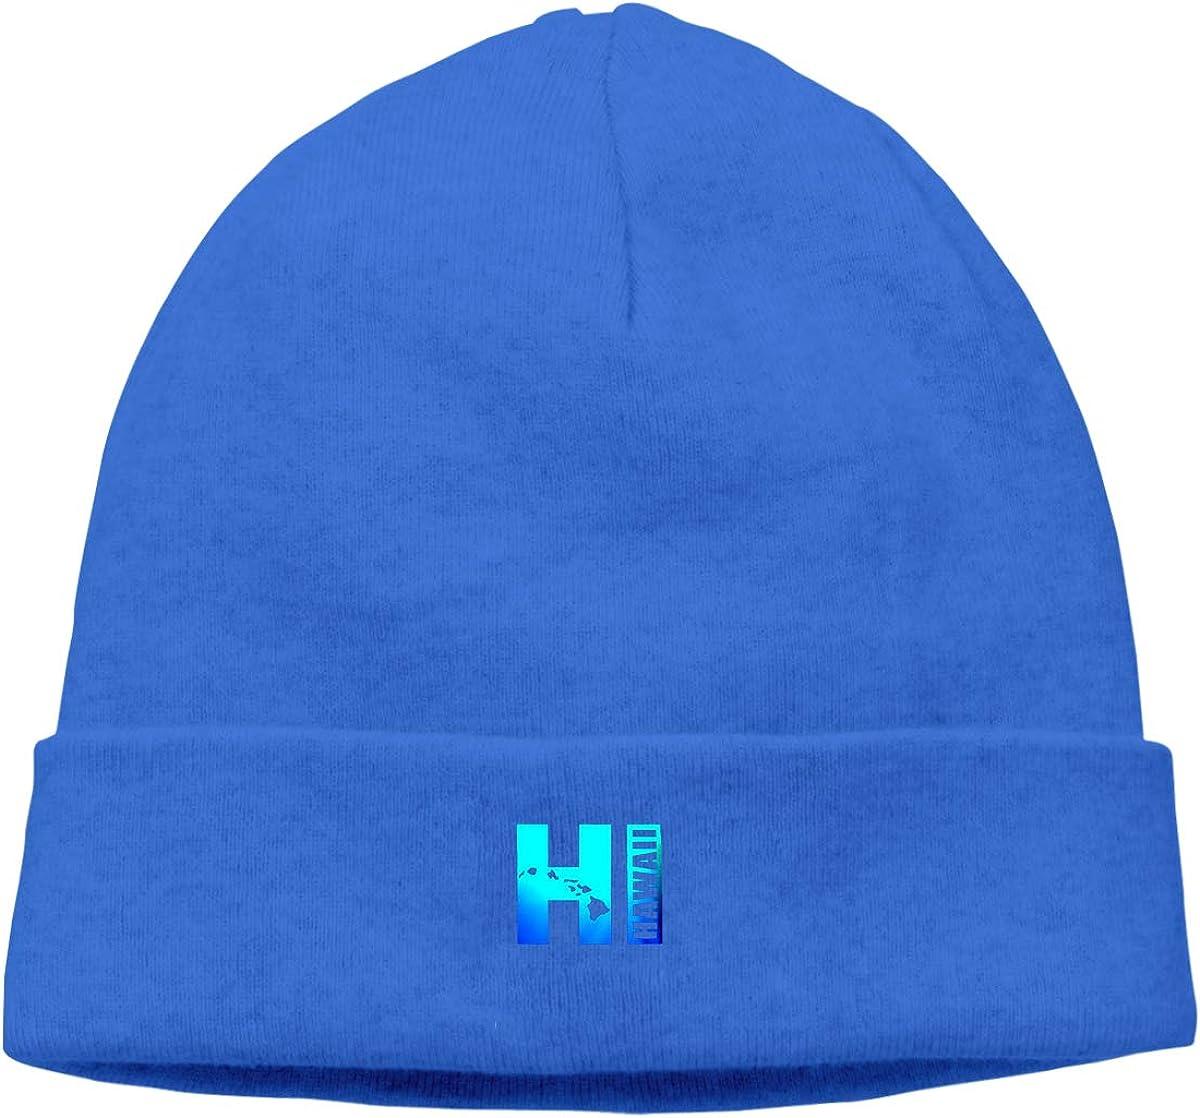 09/&JGJG Hawaii Unisex Soft Beanie Hats Winter Warm Knit Beanie Cap